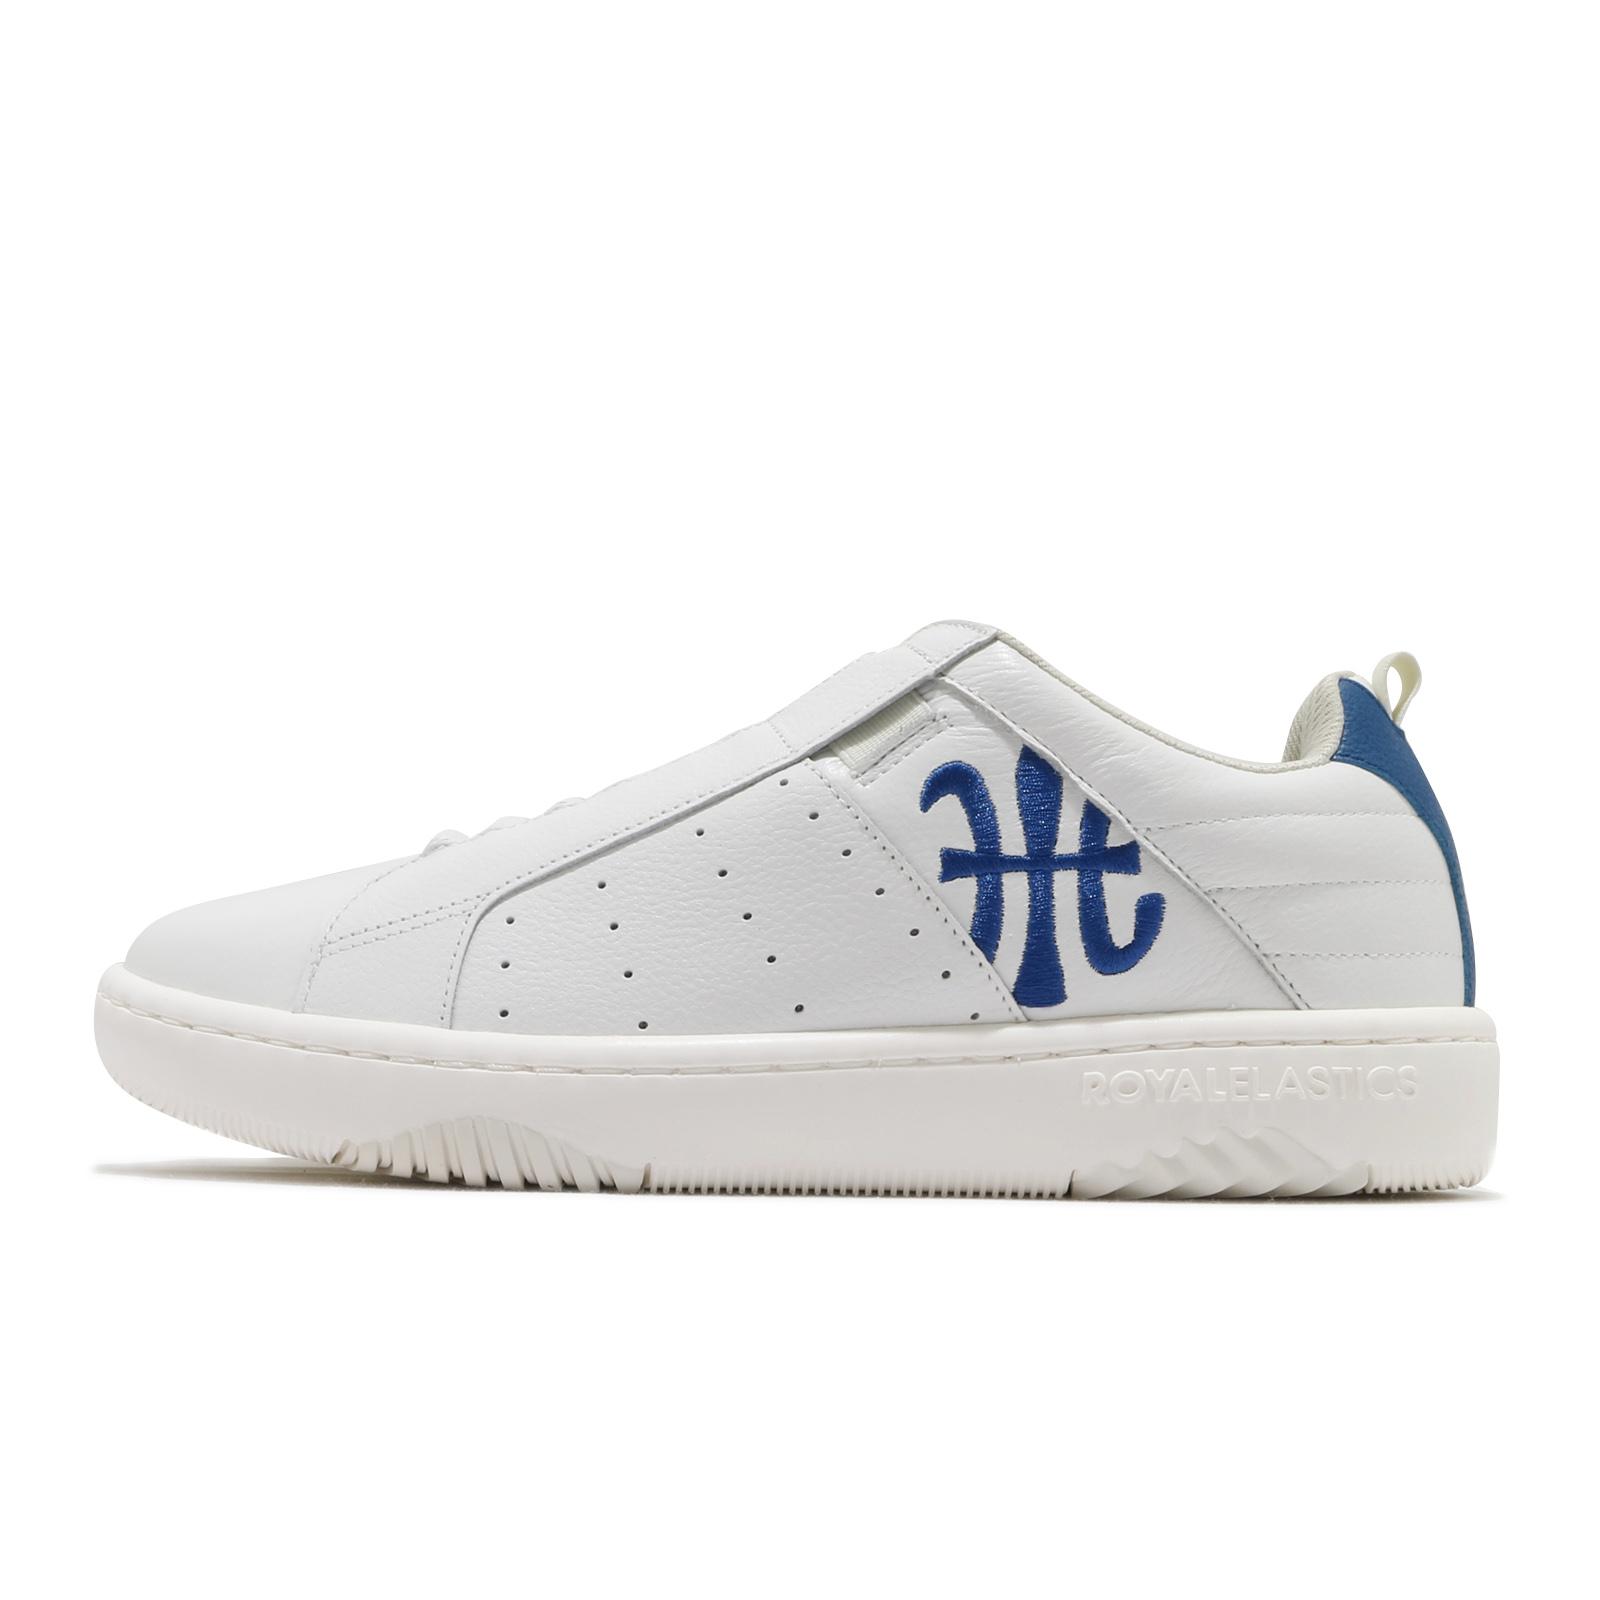 Royal Elastics 休閒鞋 Icon Manhood 2.0 白 藍 男鞋 06502-005 【ACS】